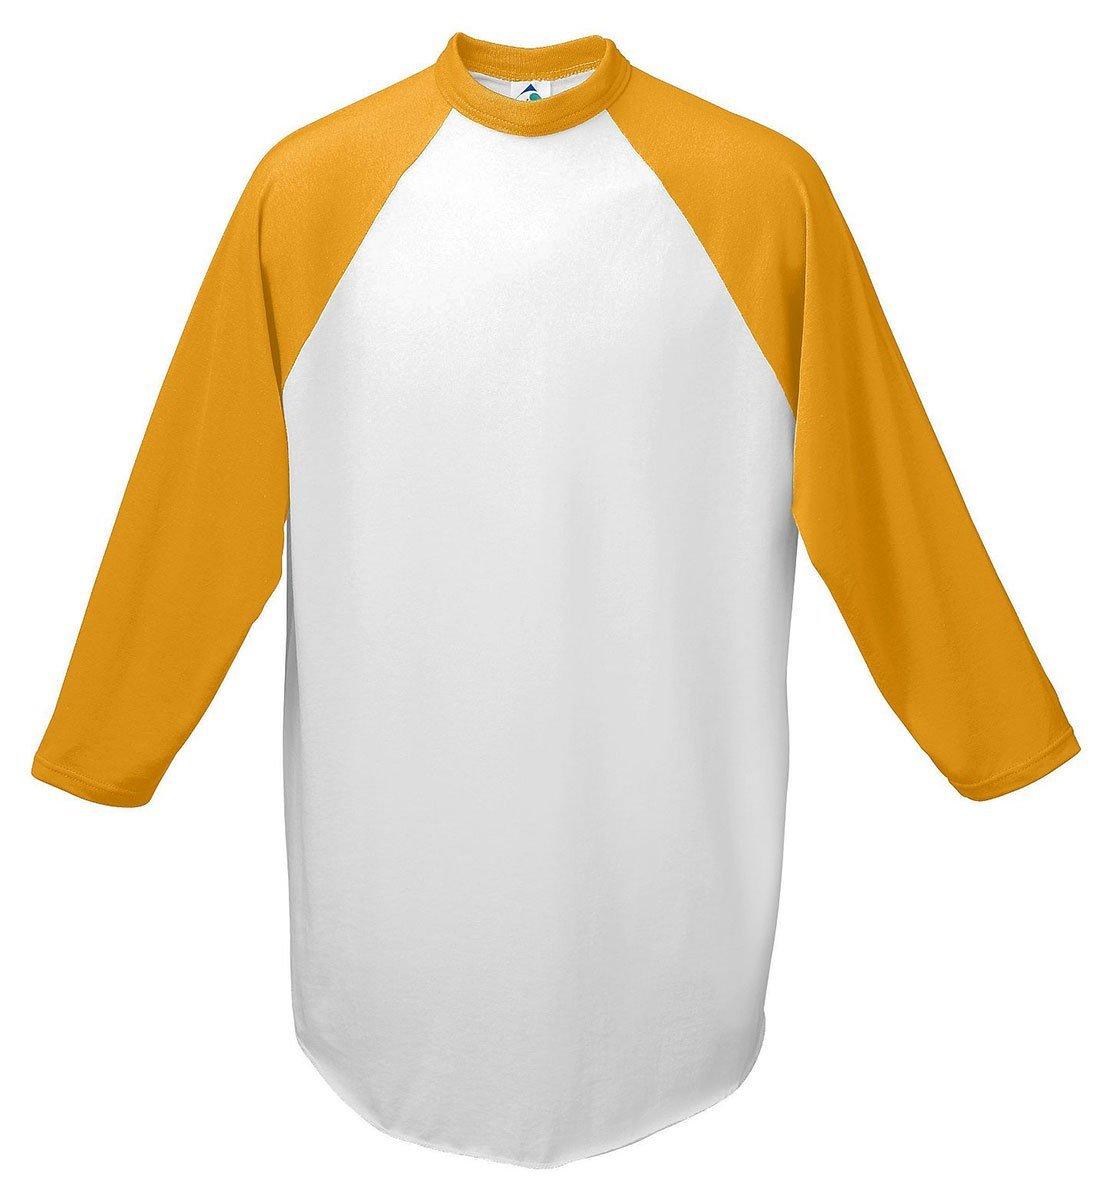 Augusta Sportswear Youth Raglan Sleeve Baseball Jersey, White Gold, Medium